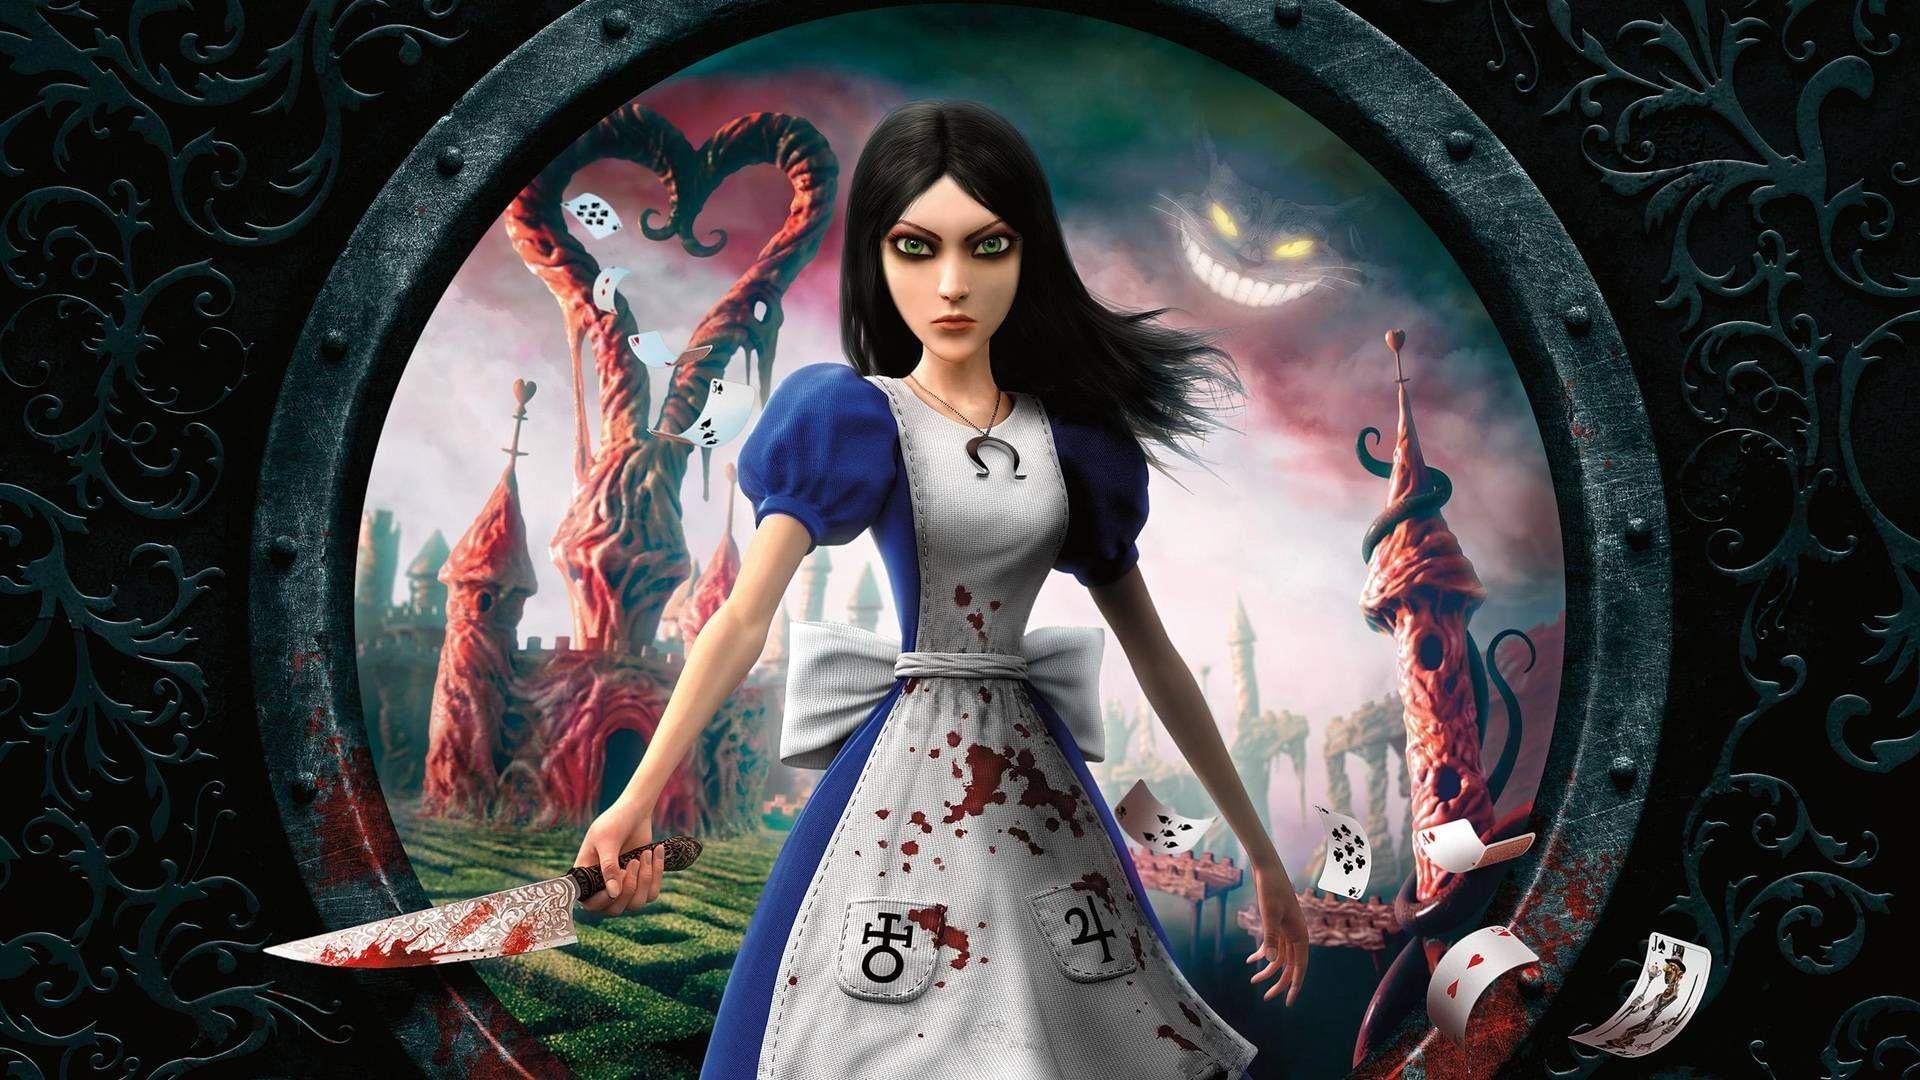 2858 - ¿Cuánto sabes del videojuego 'Alice Madness Returns'?